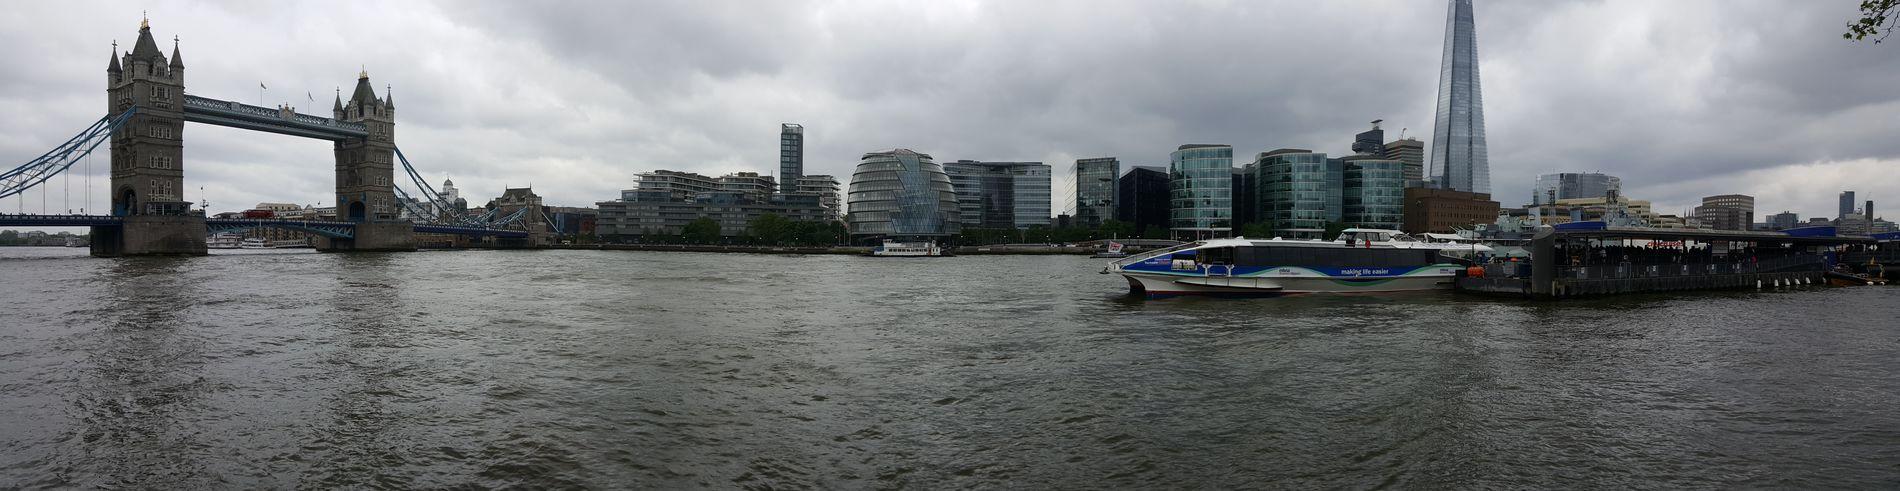 The Thames River Thames River Tower Bridge  The Shard London